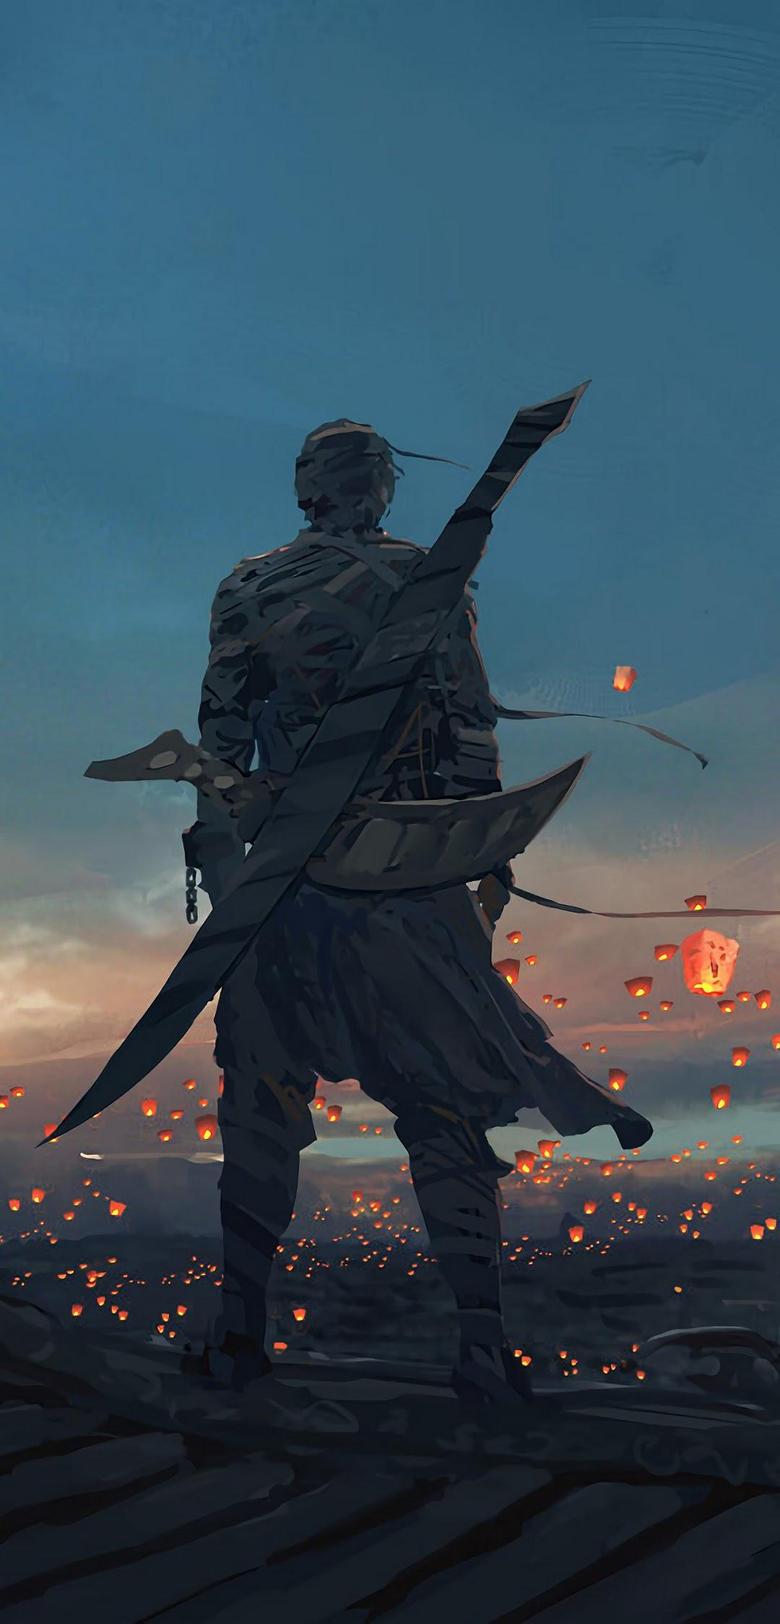 Anime Warrior Sky Lantern 4K Wallpapers